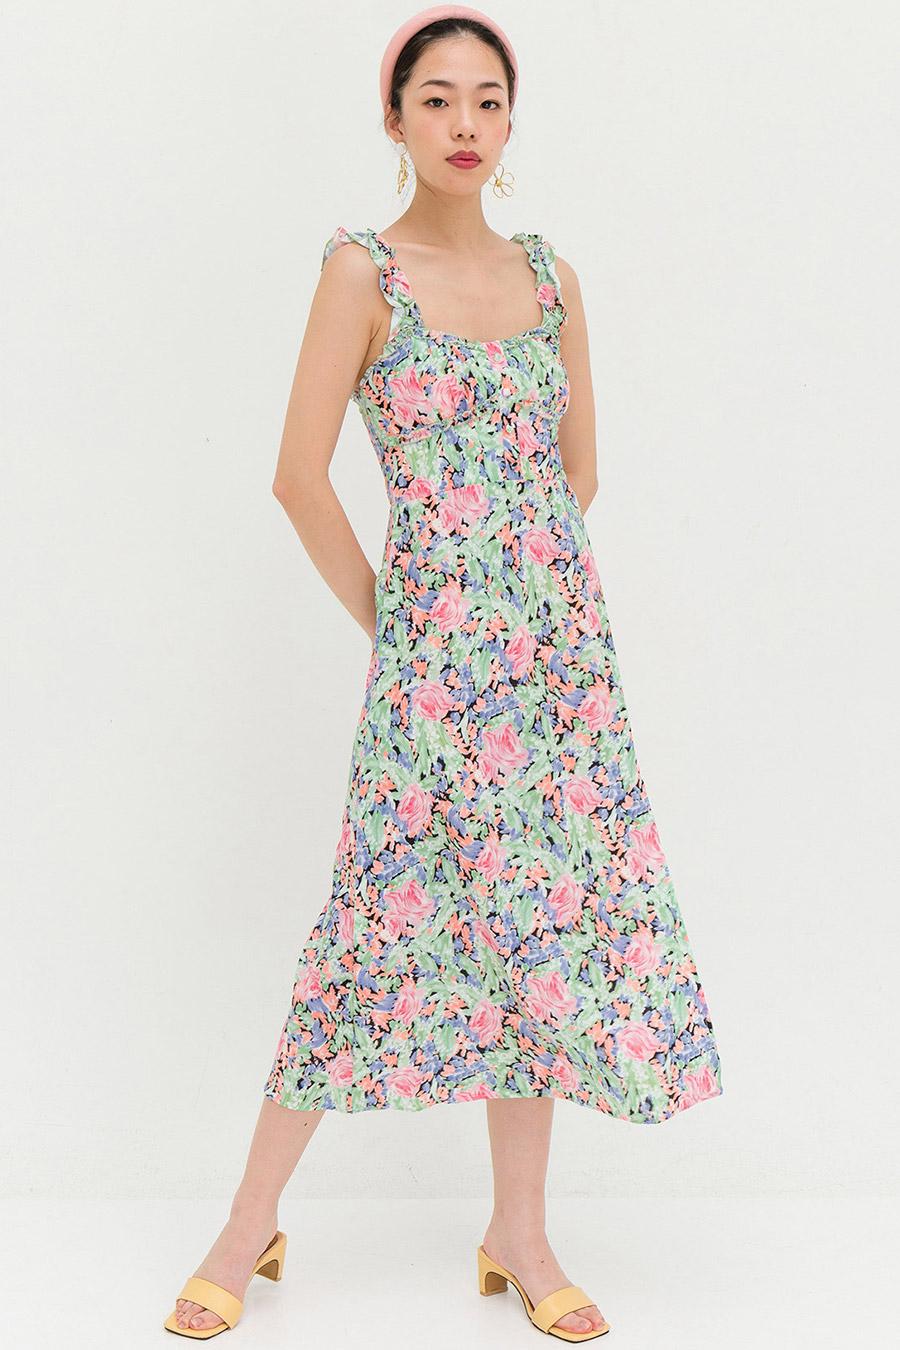 ZOEY DRESS - NOIR FLEUR